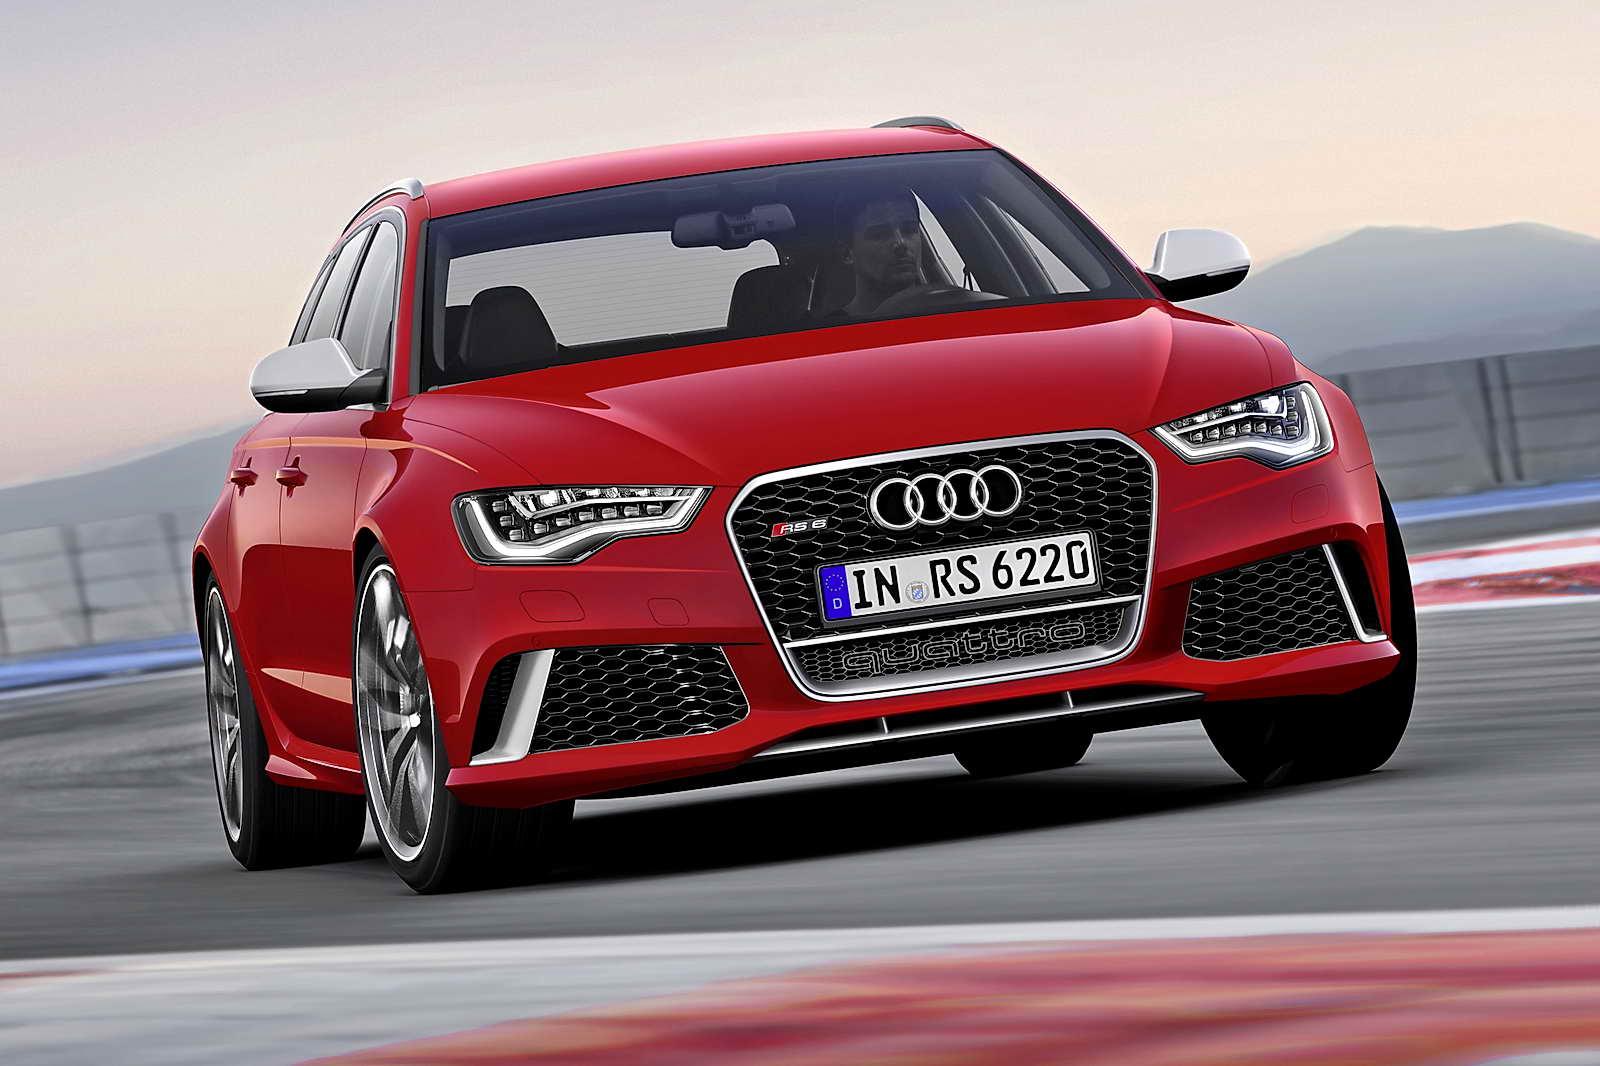 Audi_RS6_Avant_2013_01